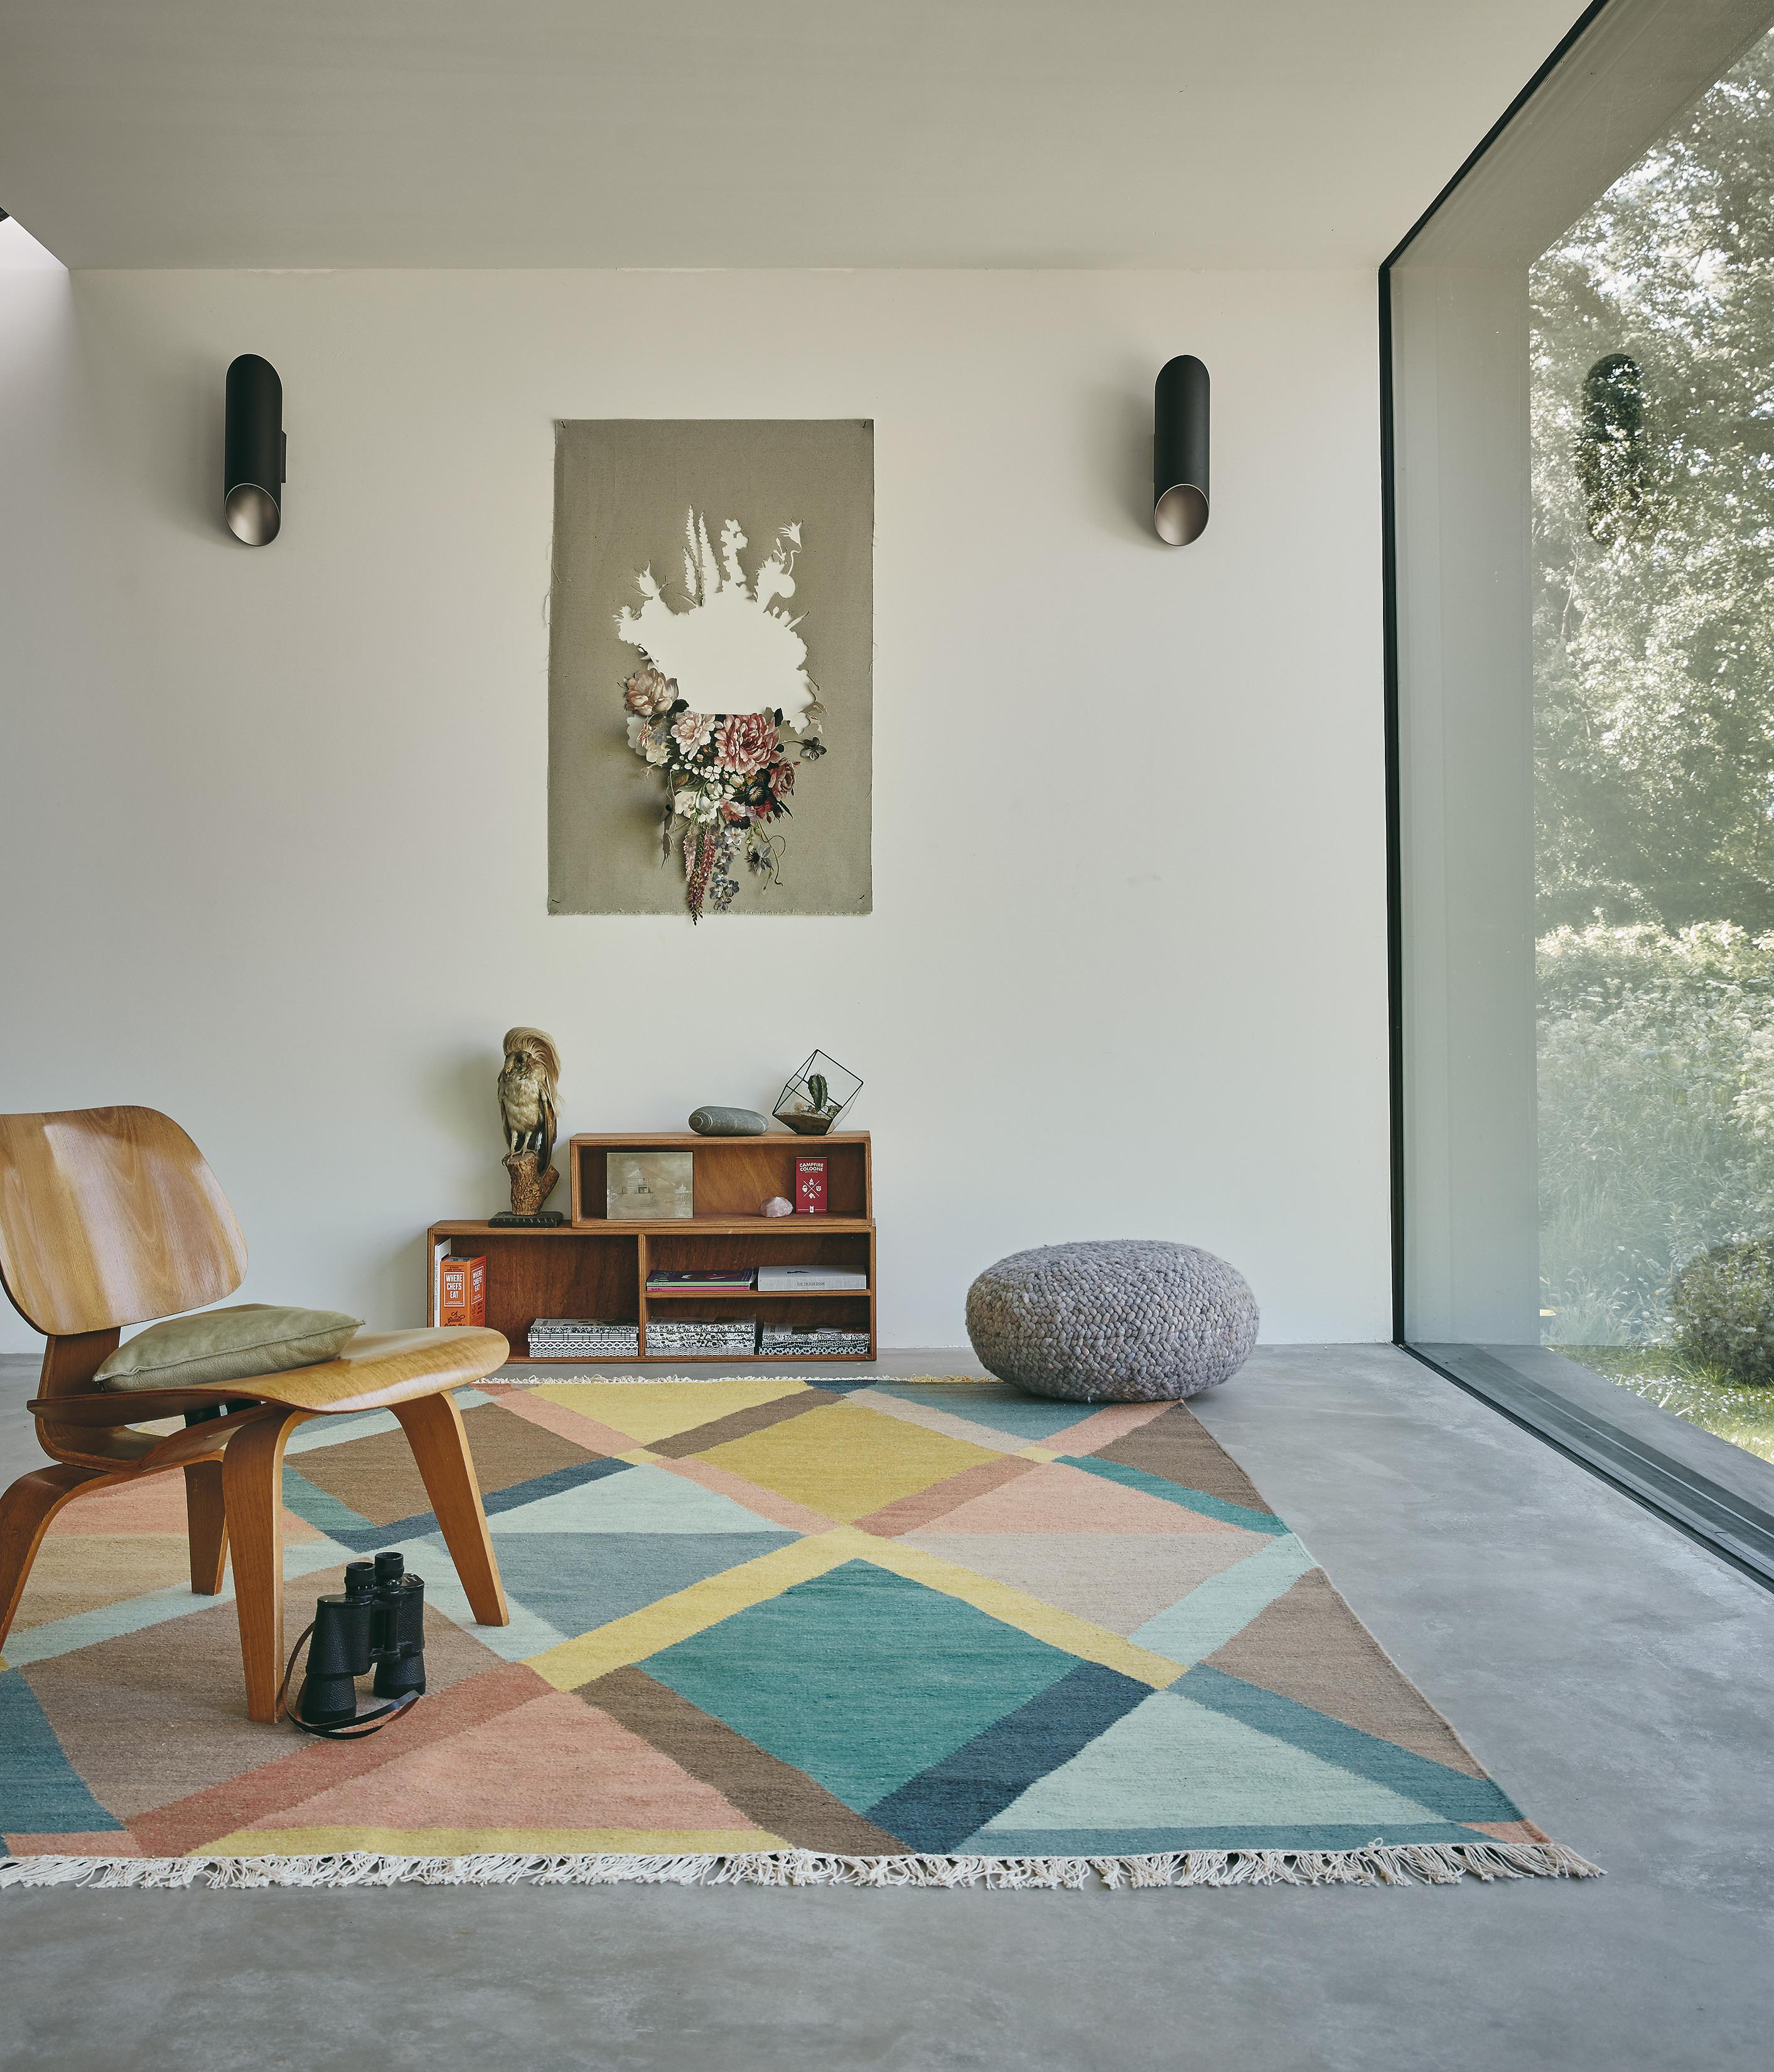 brink campman kashba jewel modern vloerkleed brokking vloerkledenspecialist. Black Bedroom Furniture Sets. Home Design Ideas